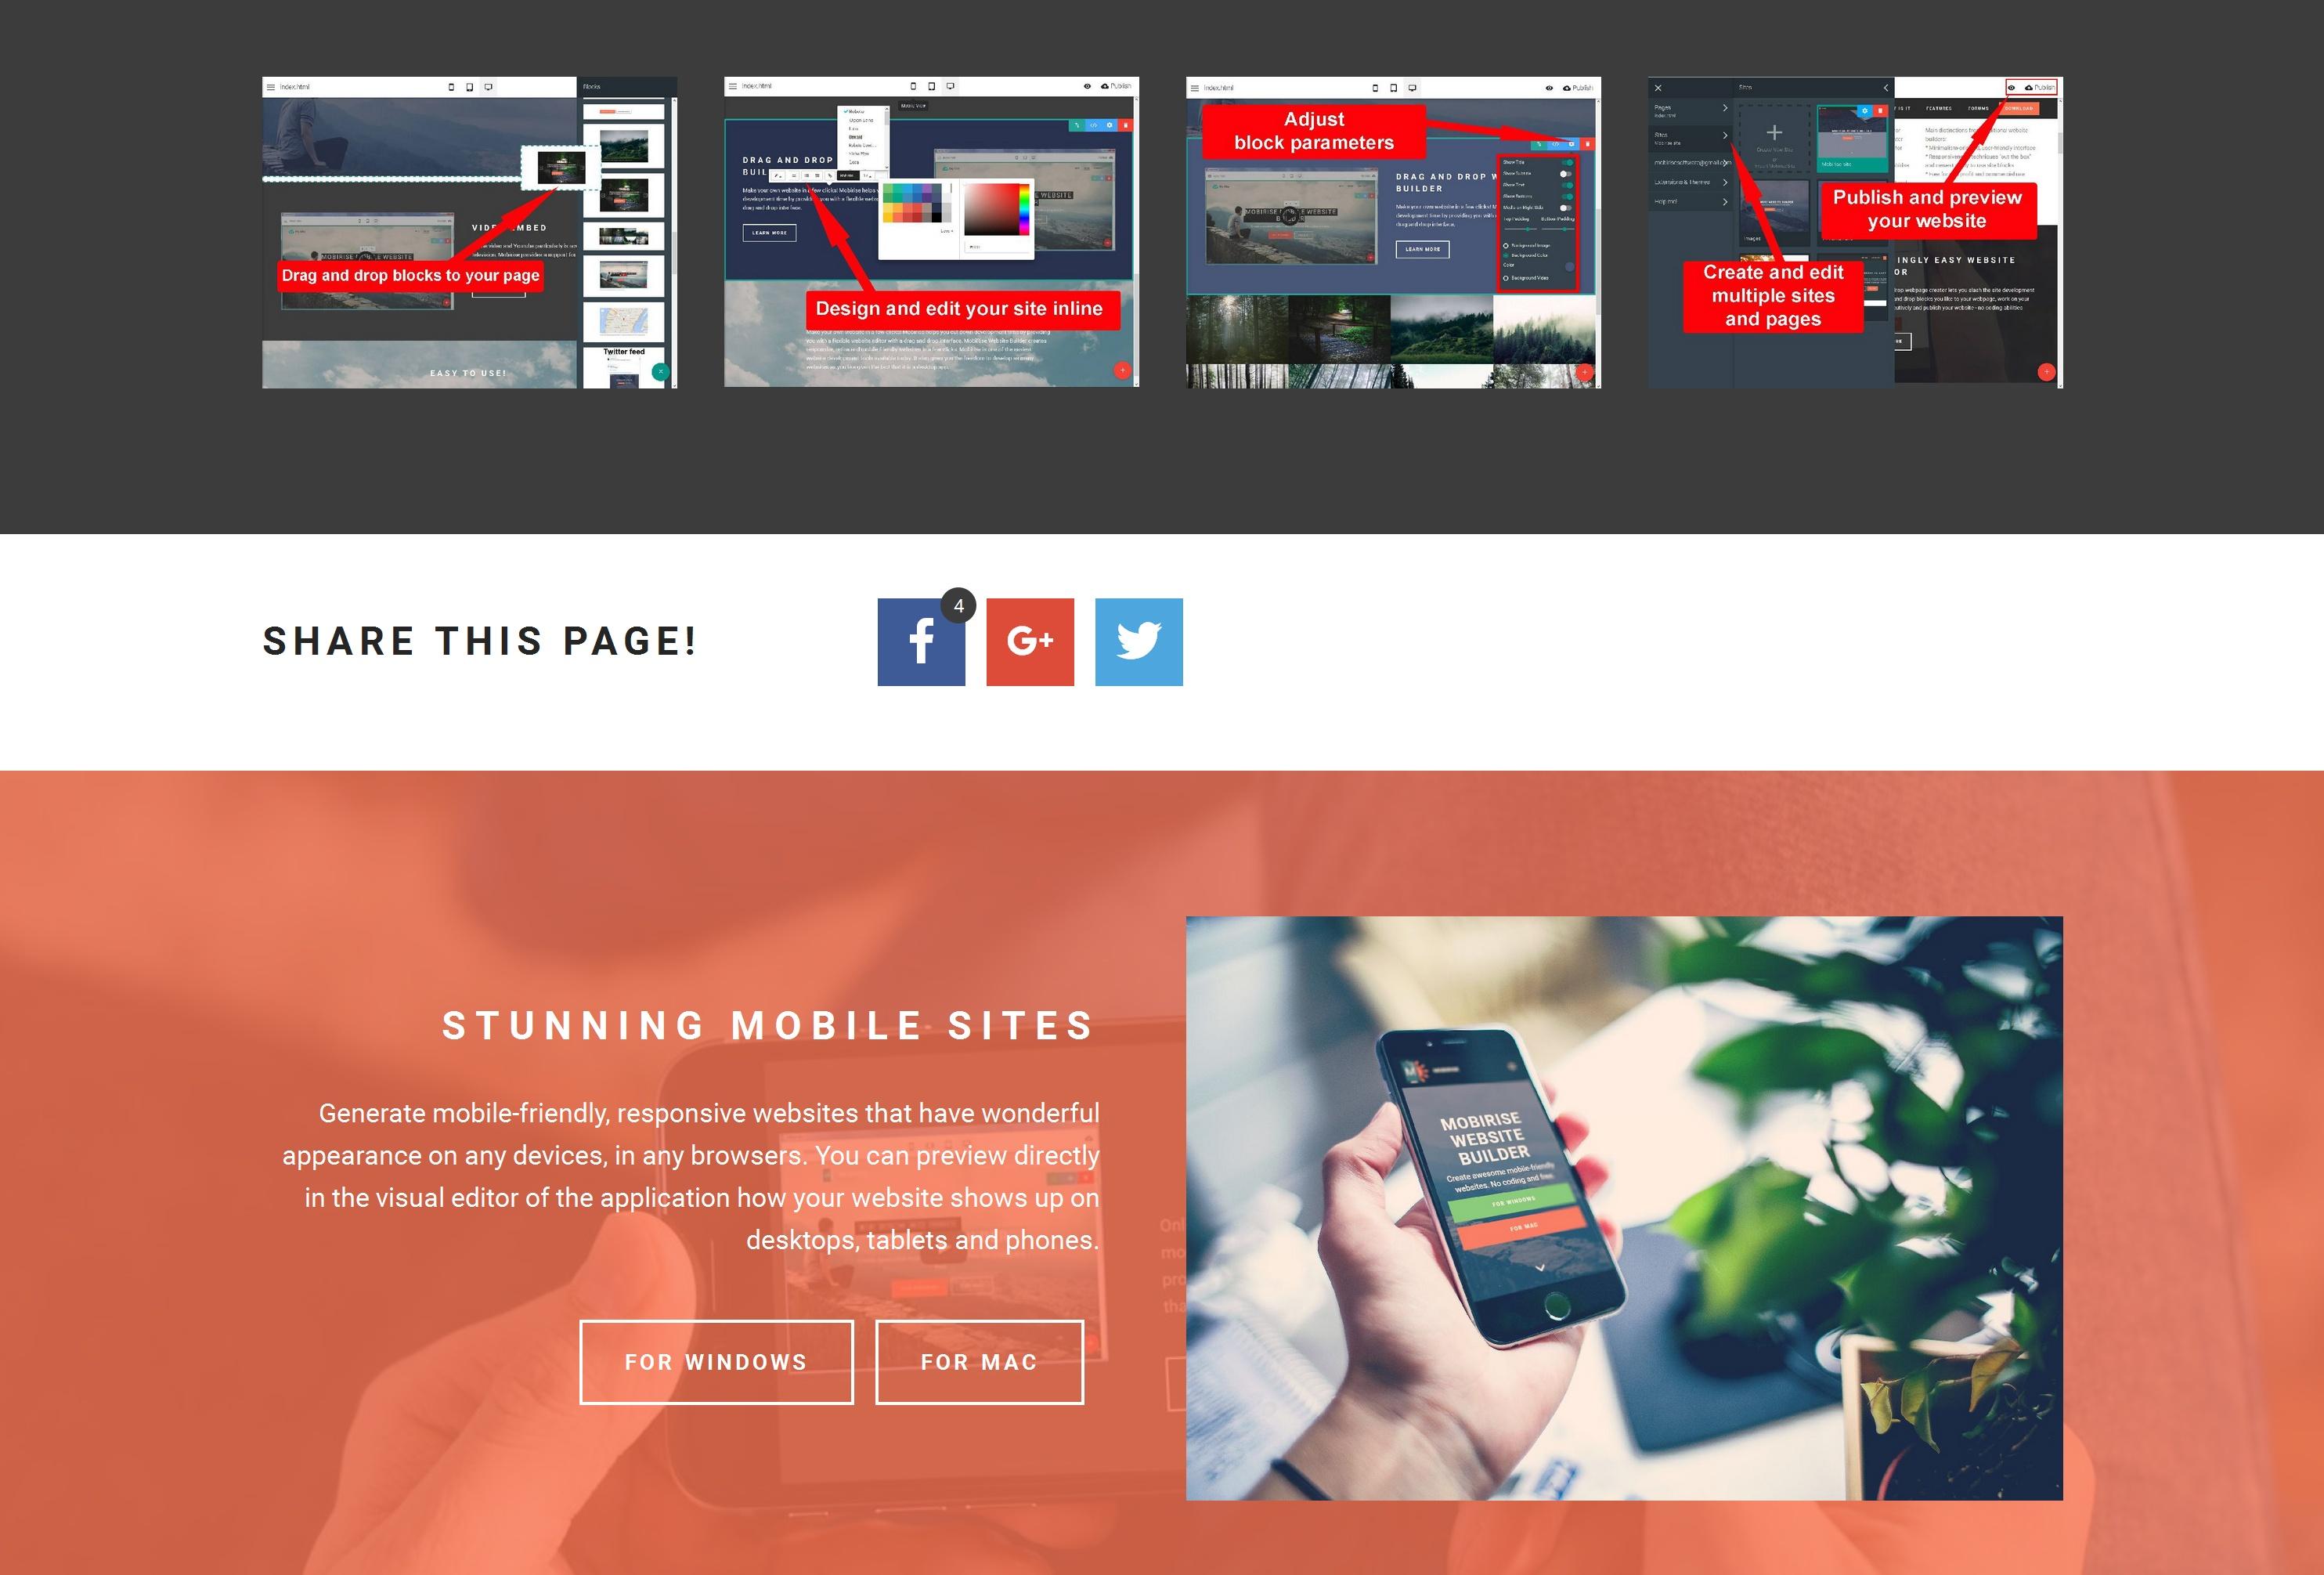 Free Drag and Drop Web Page  Creator